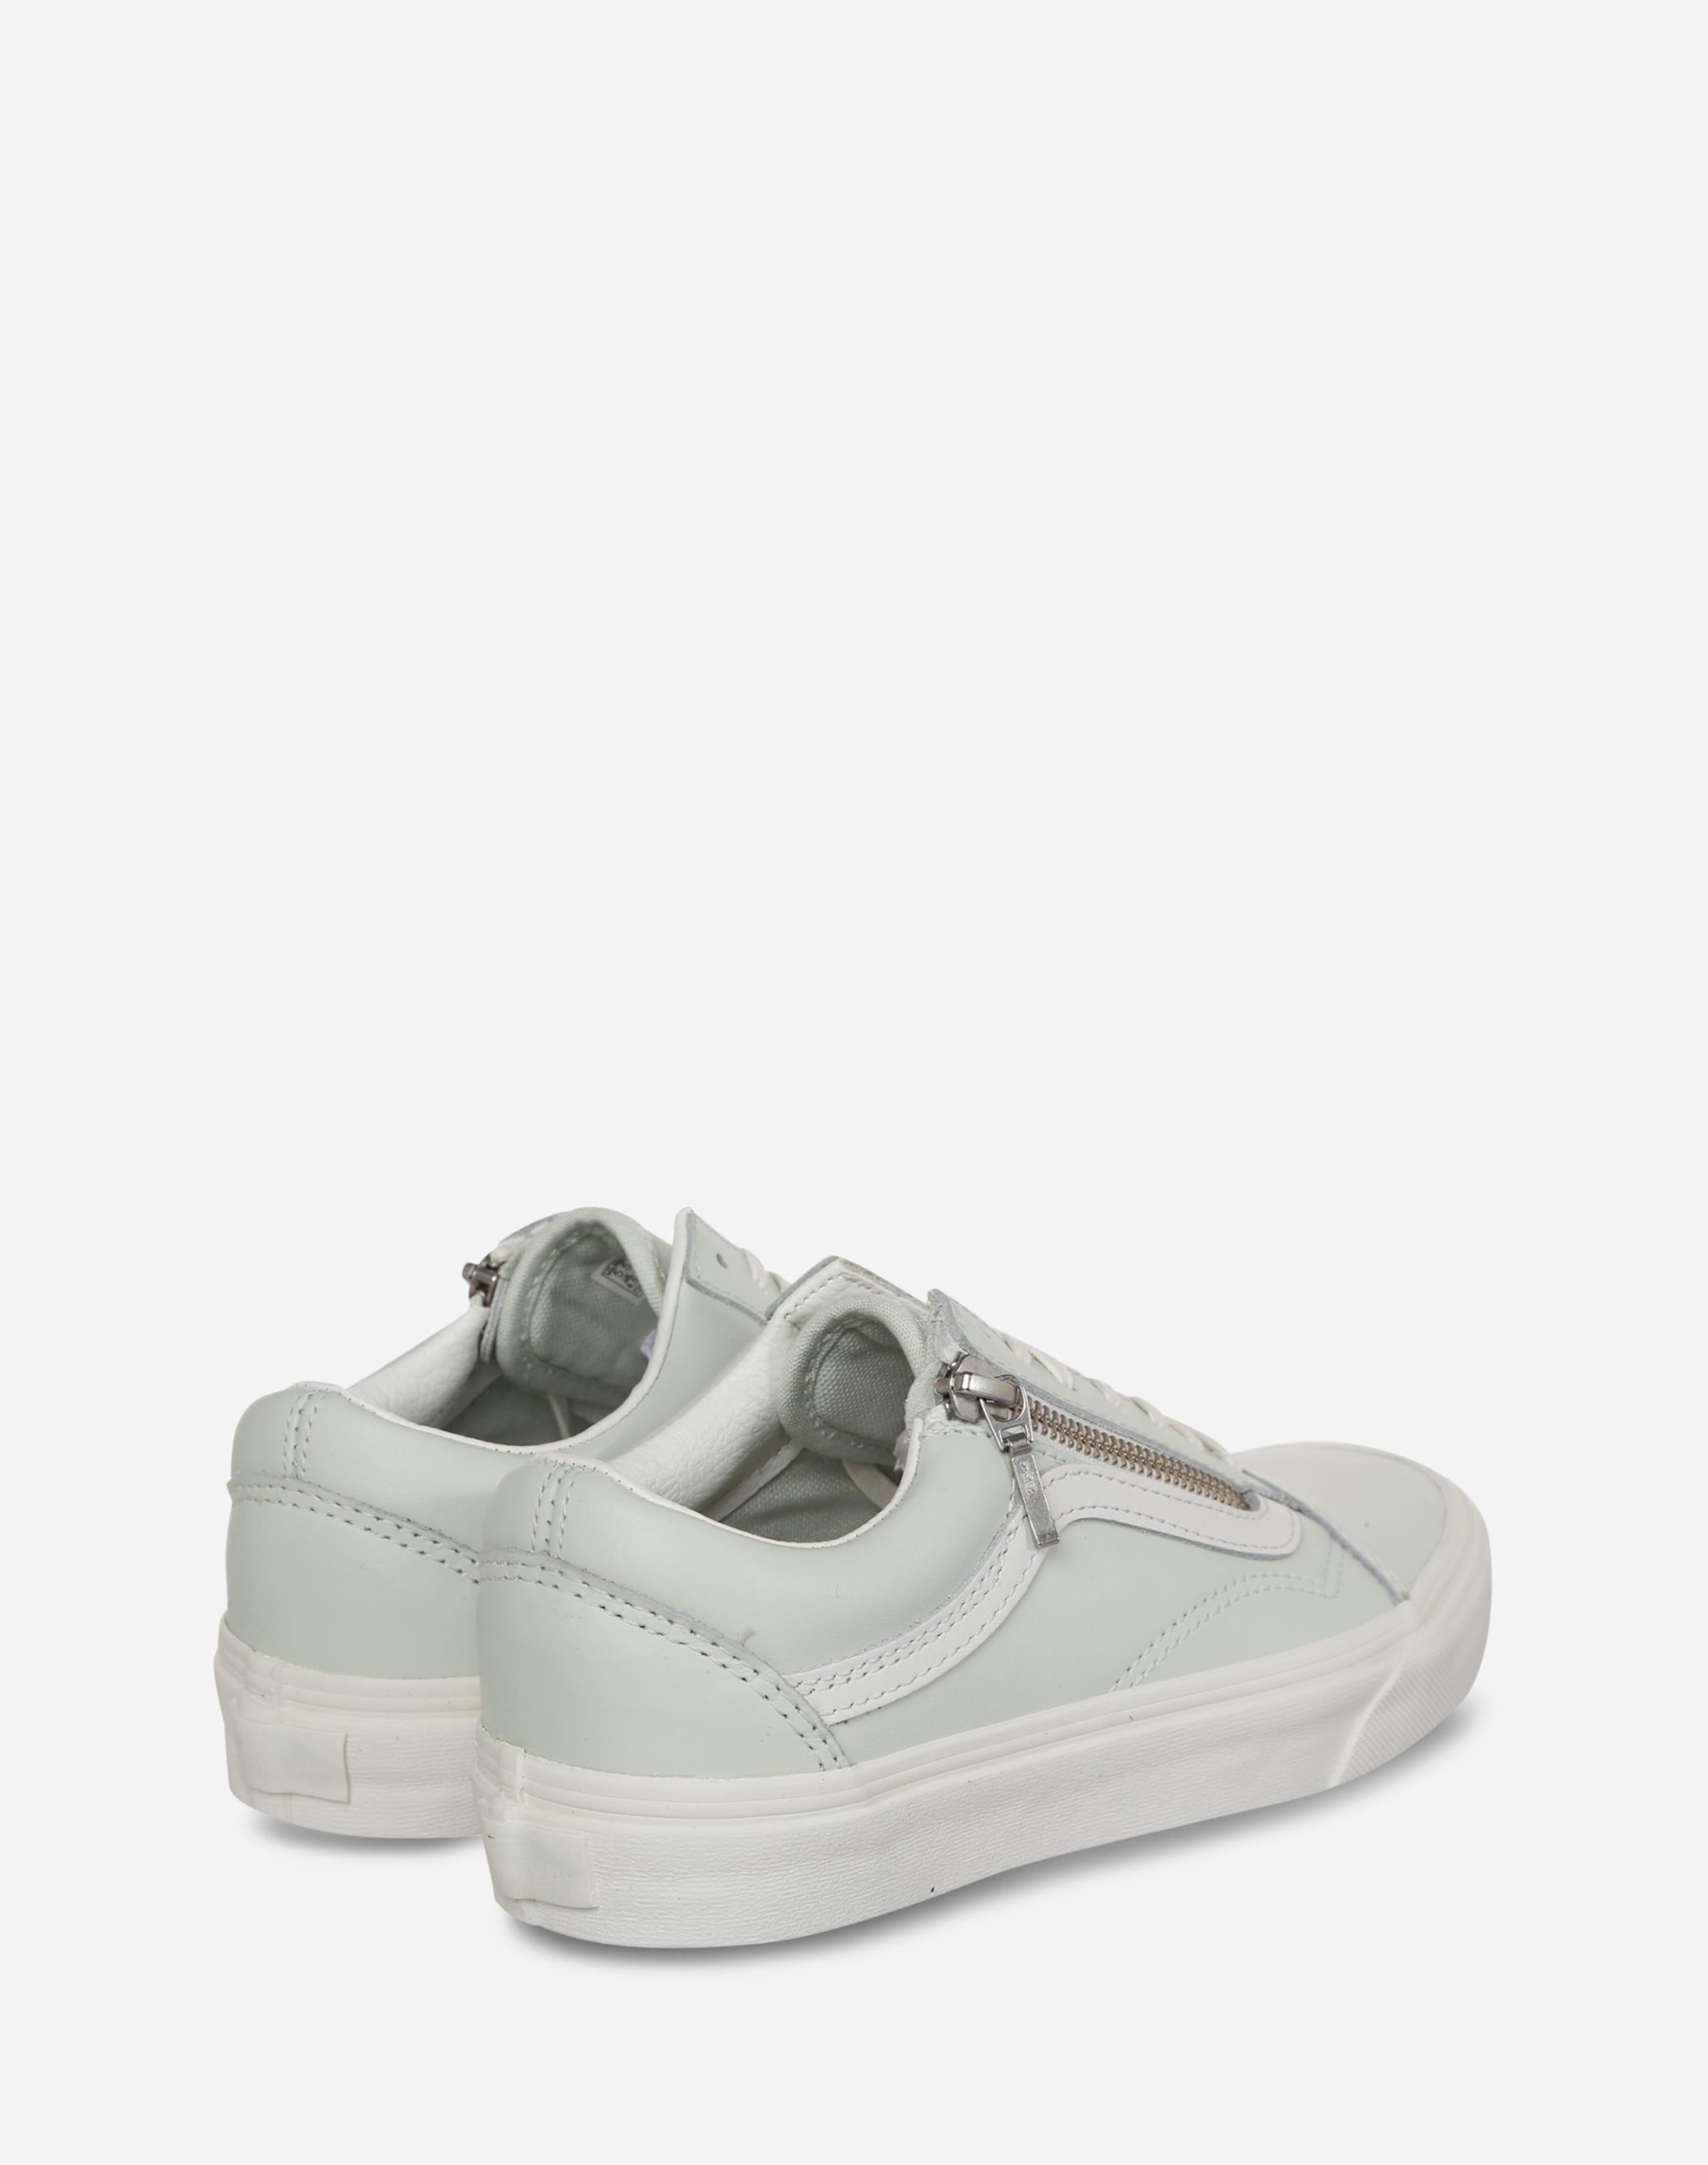 VANS Sneaker 'Old Skool' Versand Rabatt Verkauf Rabatt Nicekicks Großhandelspreis Zu Verkaufen Billige Usa Händler GYIBwQ4L9S